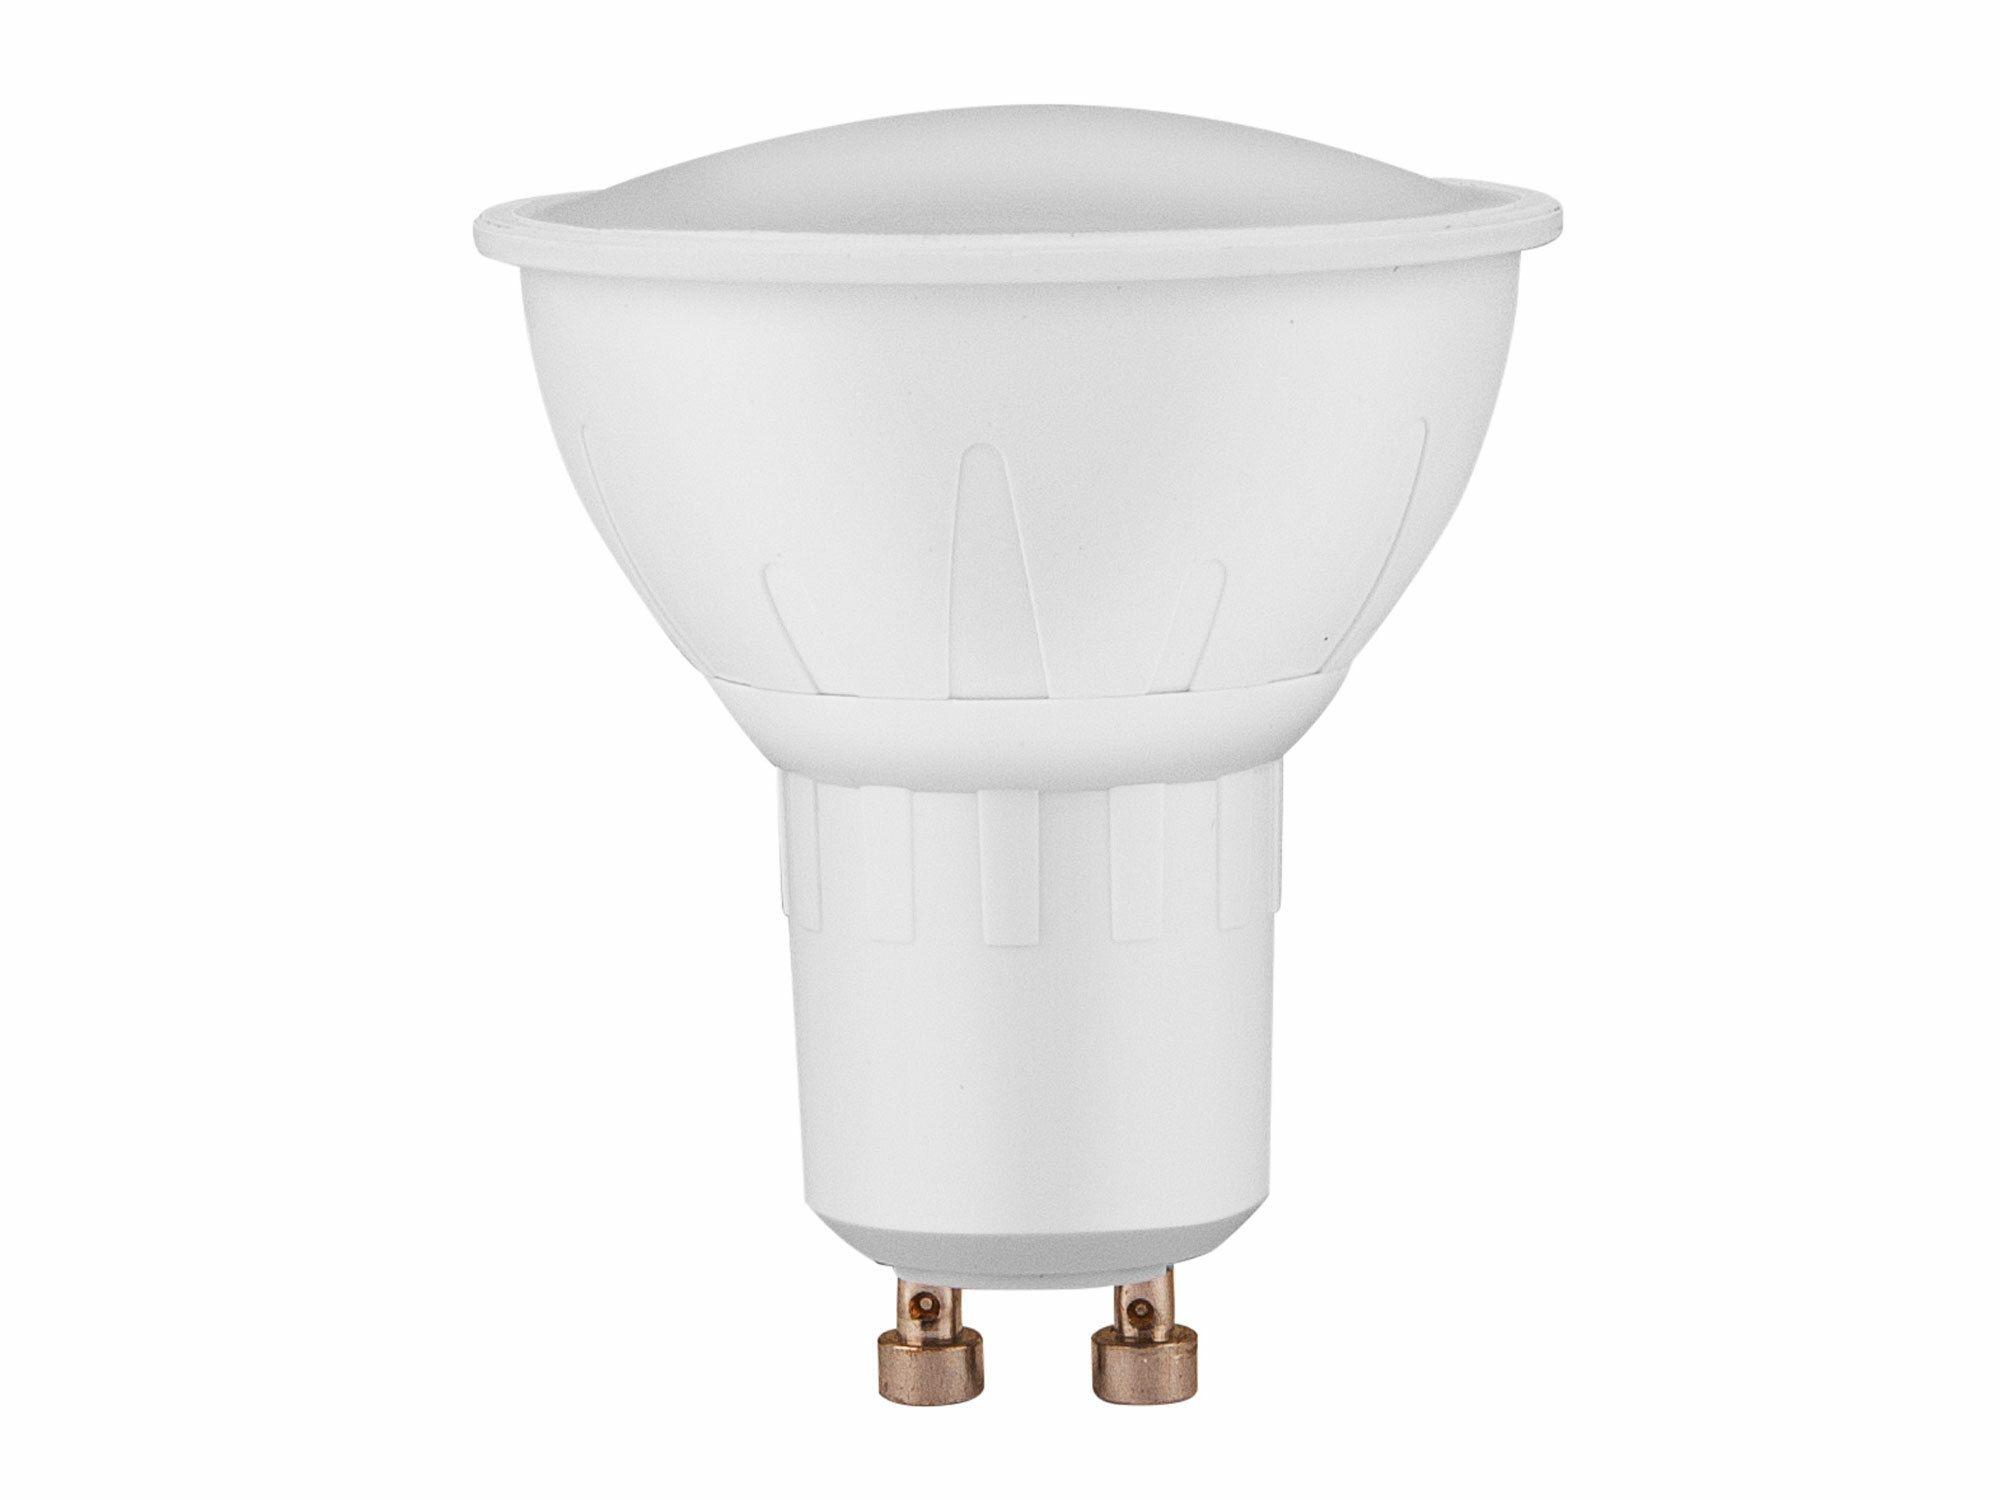 Žárovka LED reflektorová, 6W, 470lm, GU10, denní bílá EXTOL-LIGHT